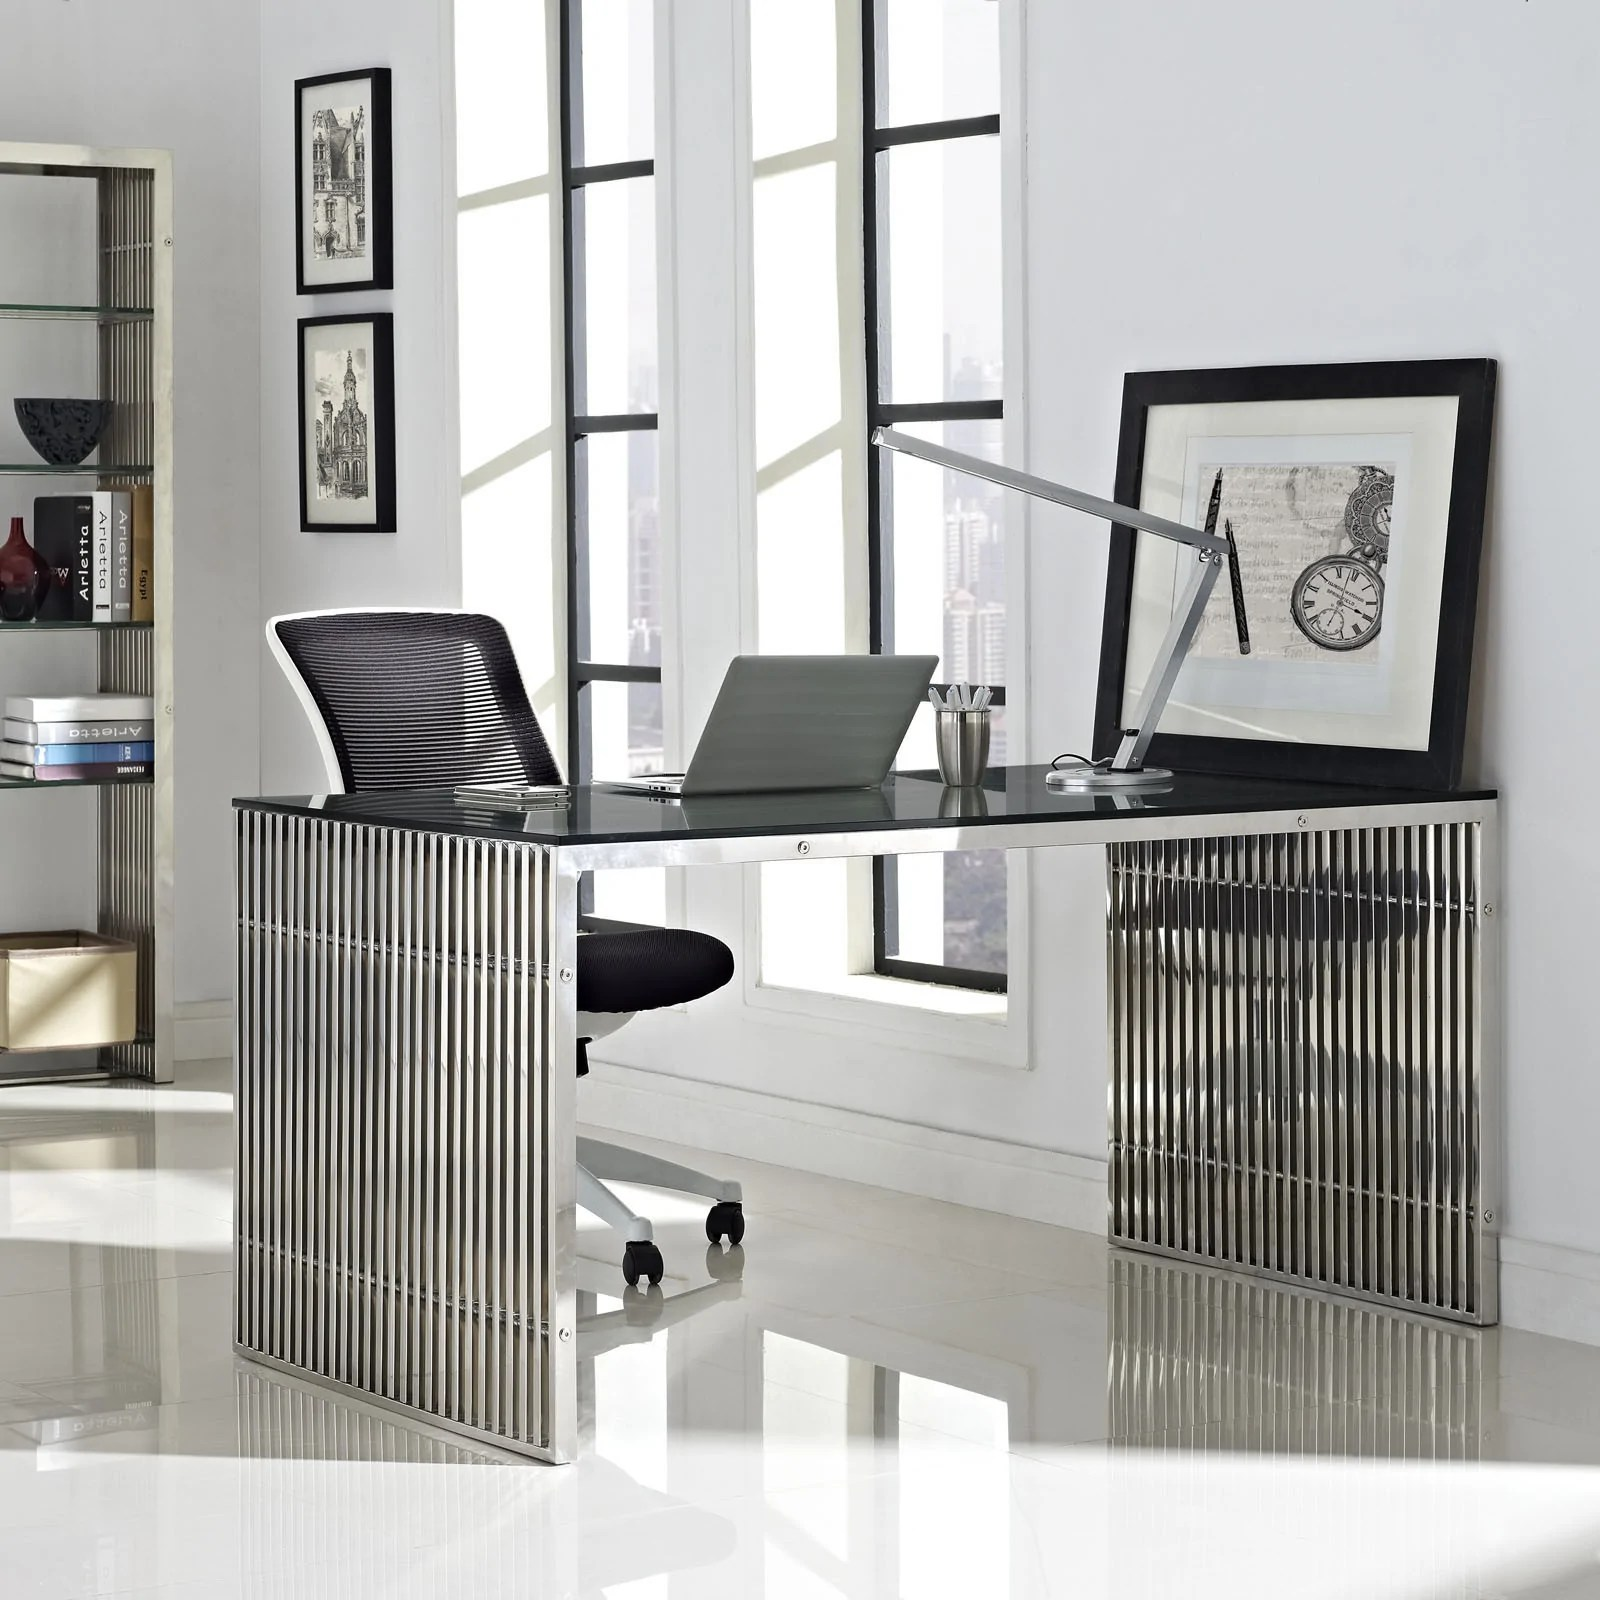 modway furniture gridiron stainless